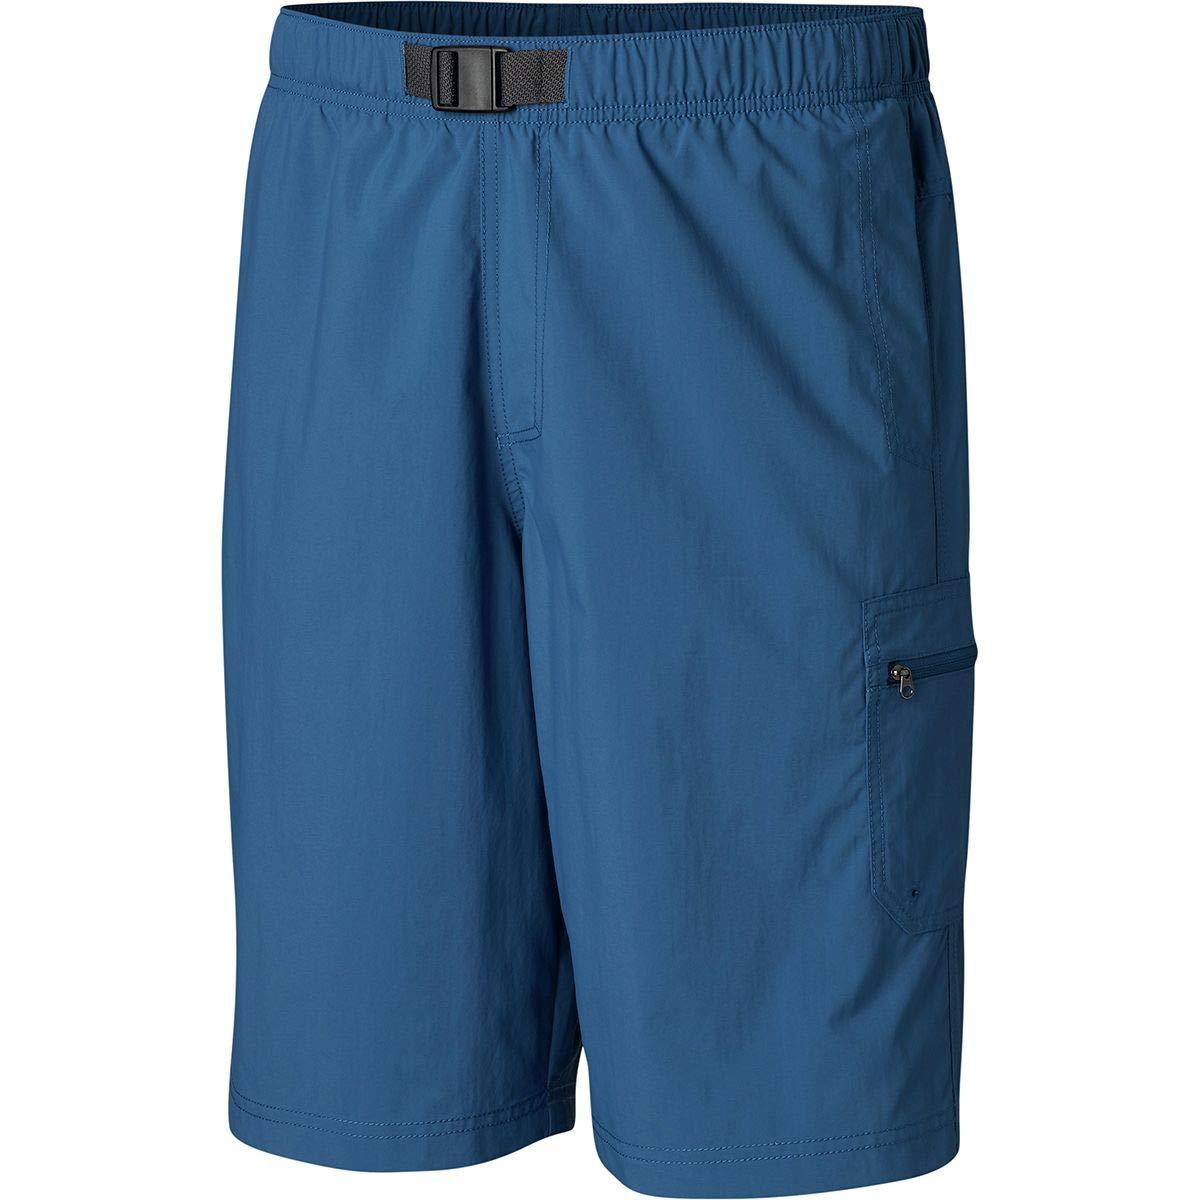 Columbia Men's Palmerston Peak Short, Waterproof, UV Sun Protection, Impulse Blue, Small x 9'' Inseam by Columbia